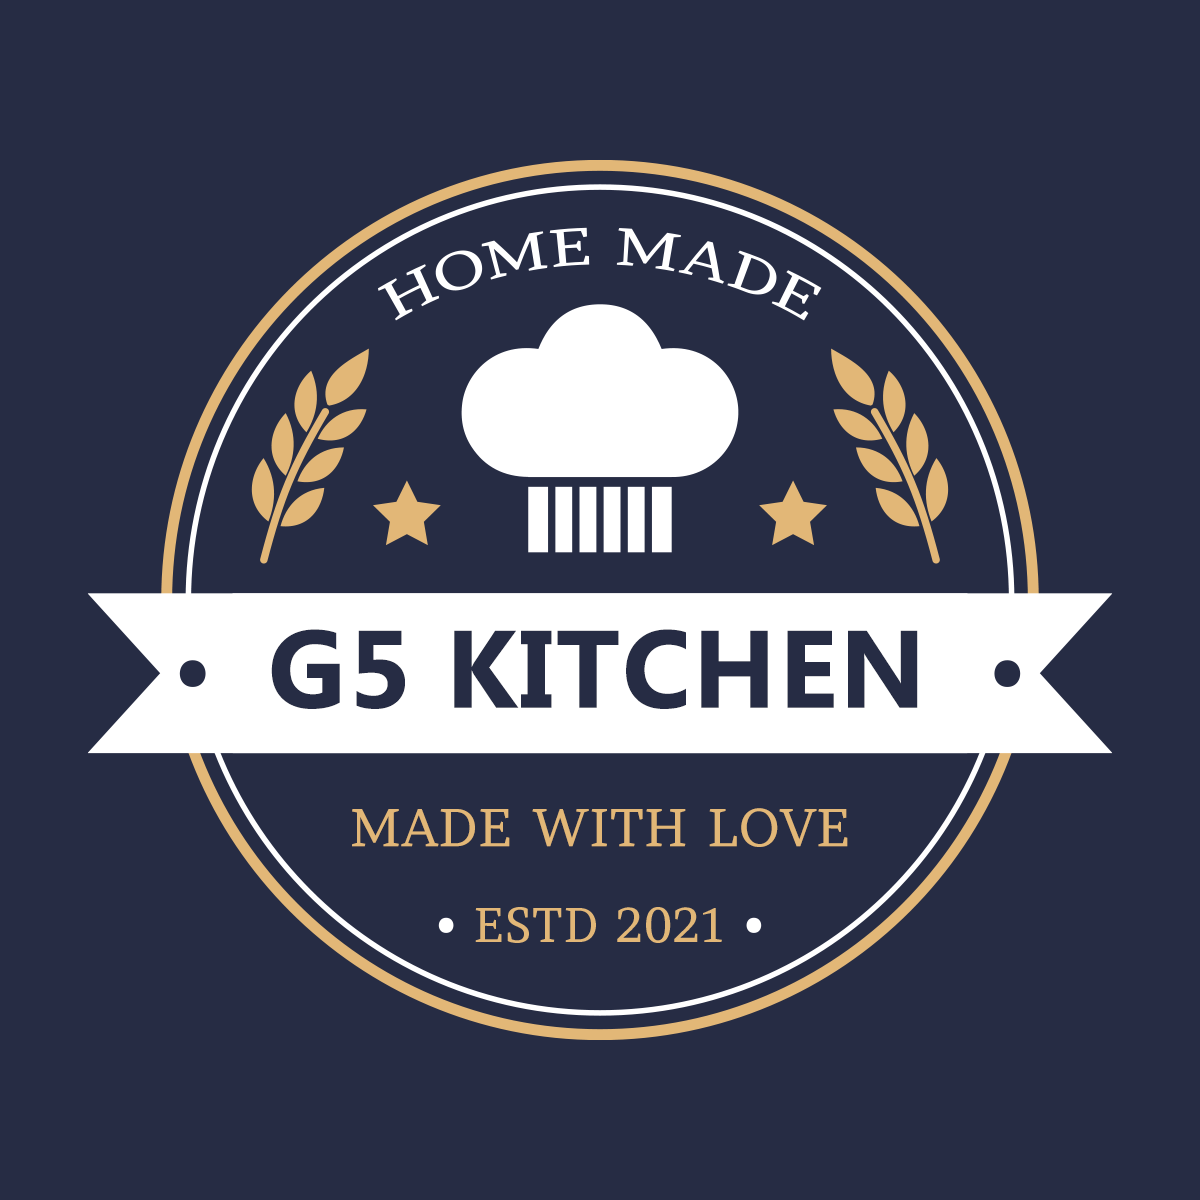 Program Reseller G5 Kitchen Image